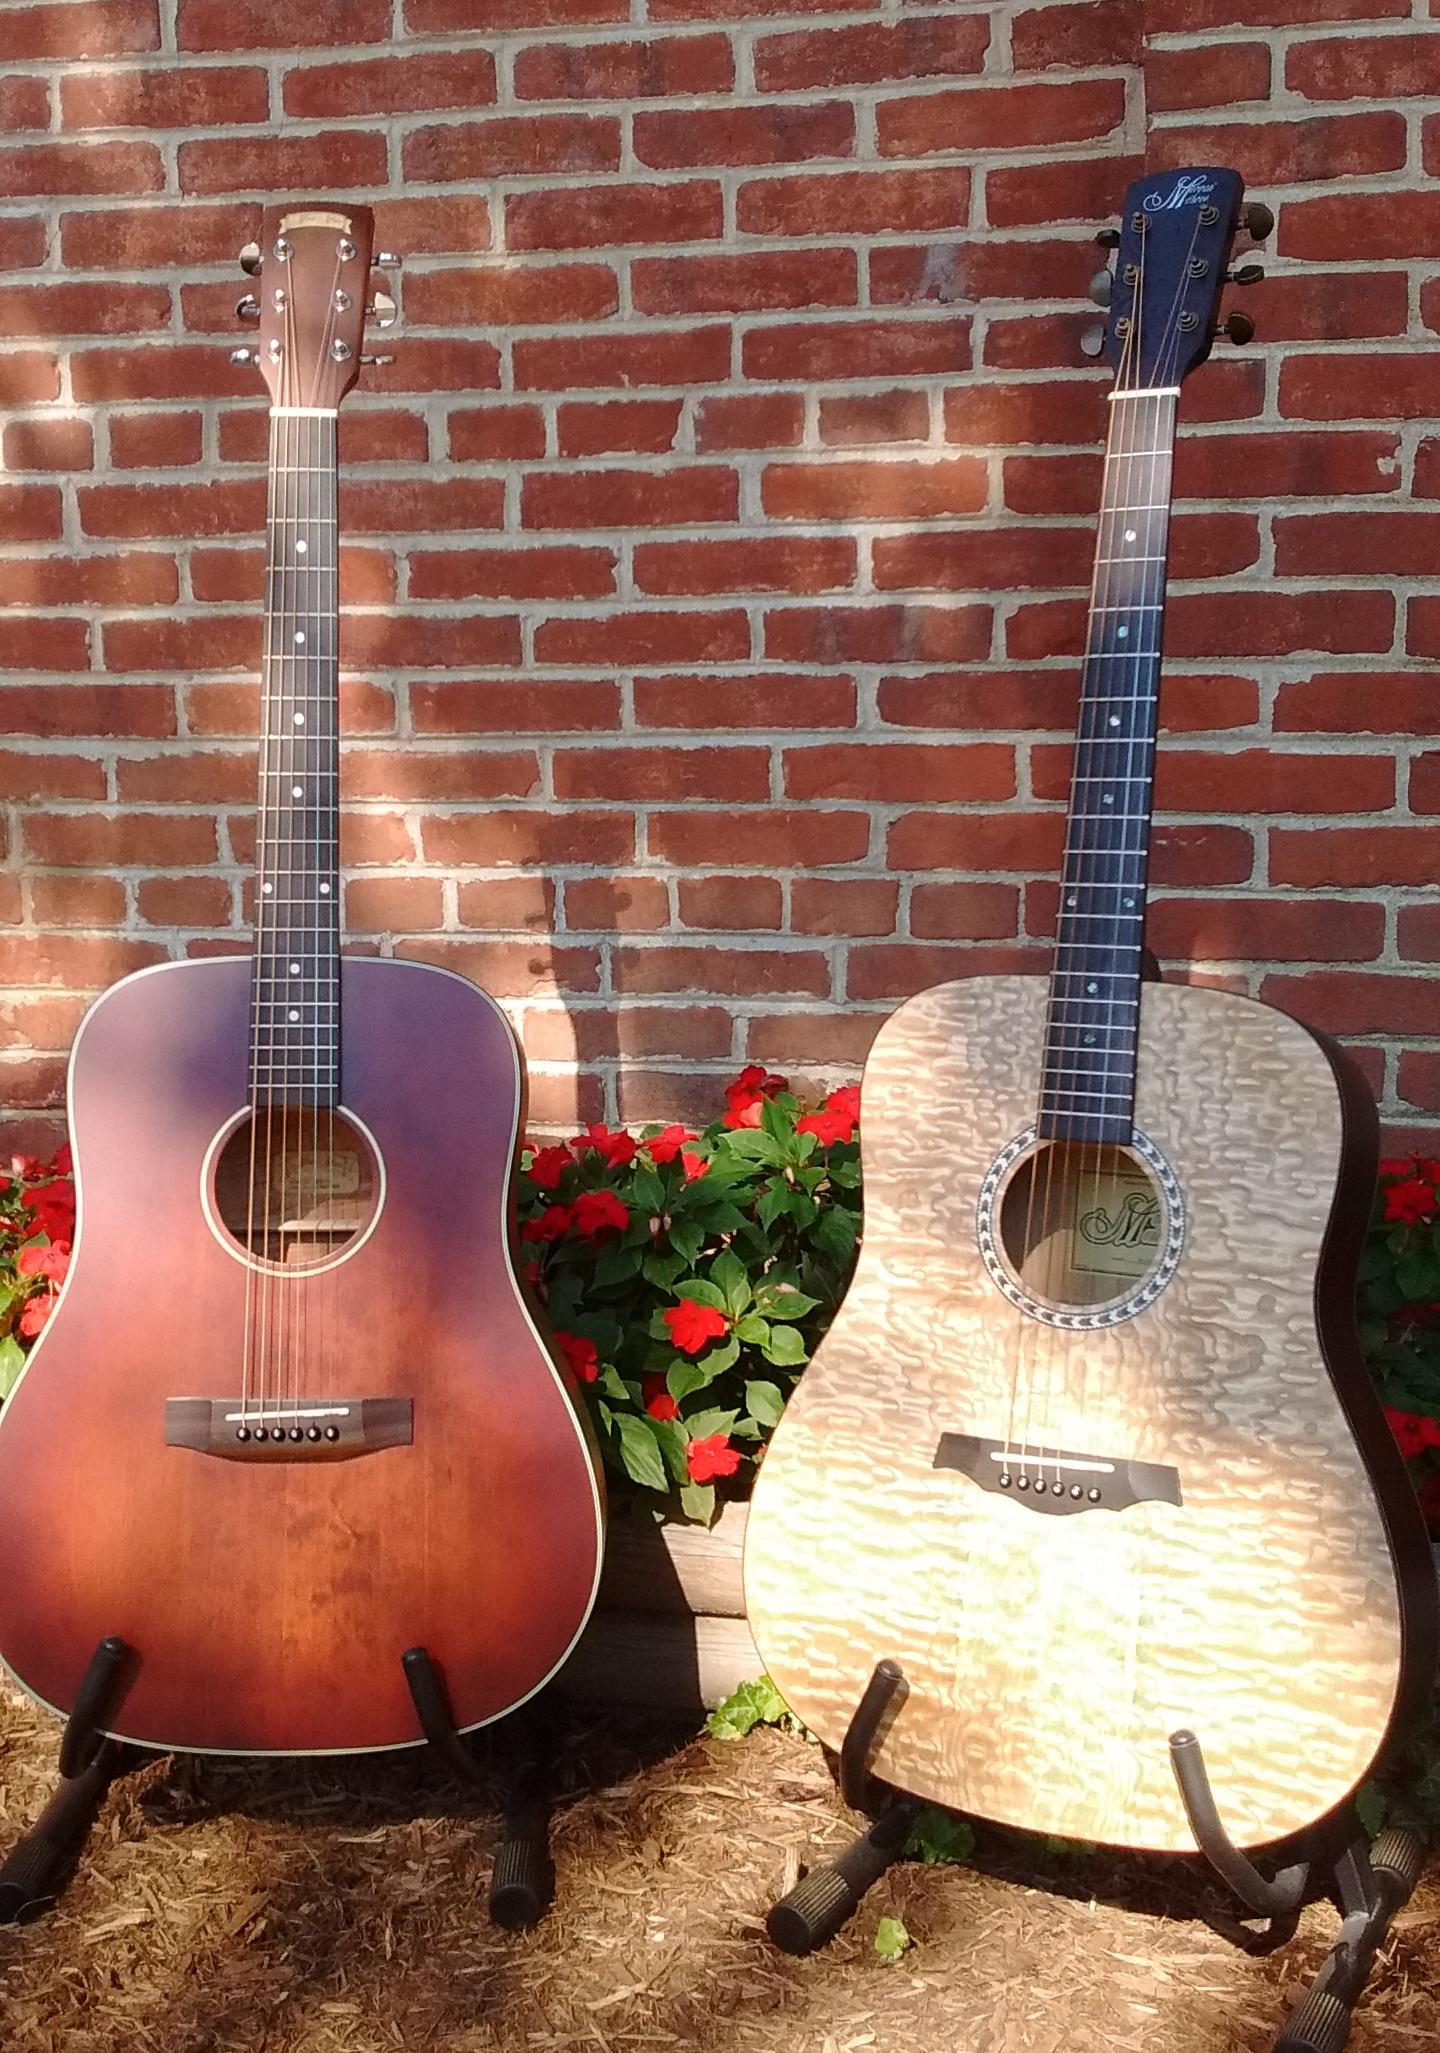 Morgan-Monroe MDC-1B Creekside Acoustic Guitar and Morgan-Monroe M-15QN Quilt Figured Ash